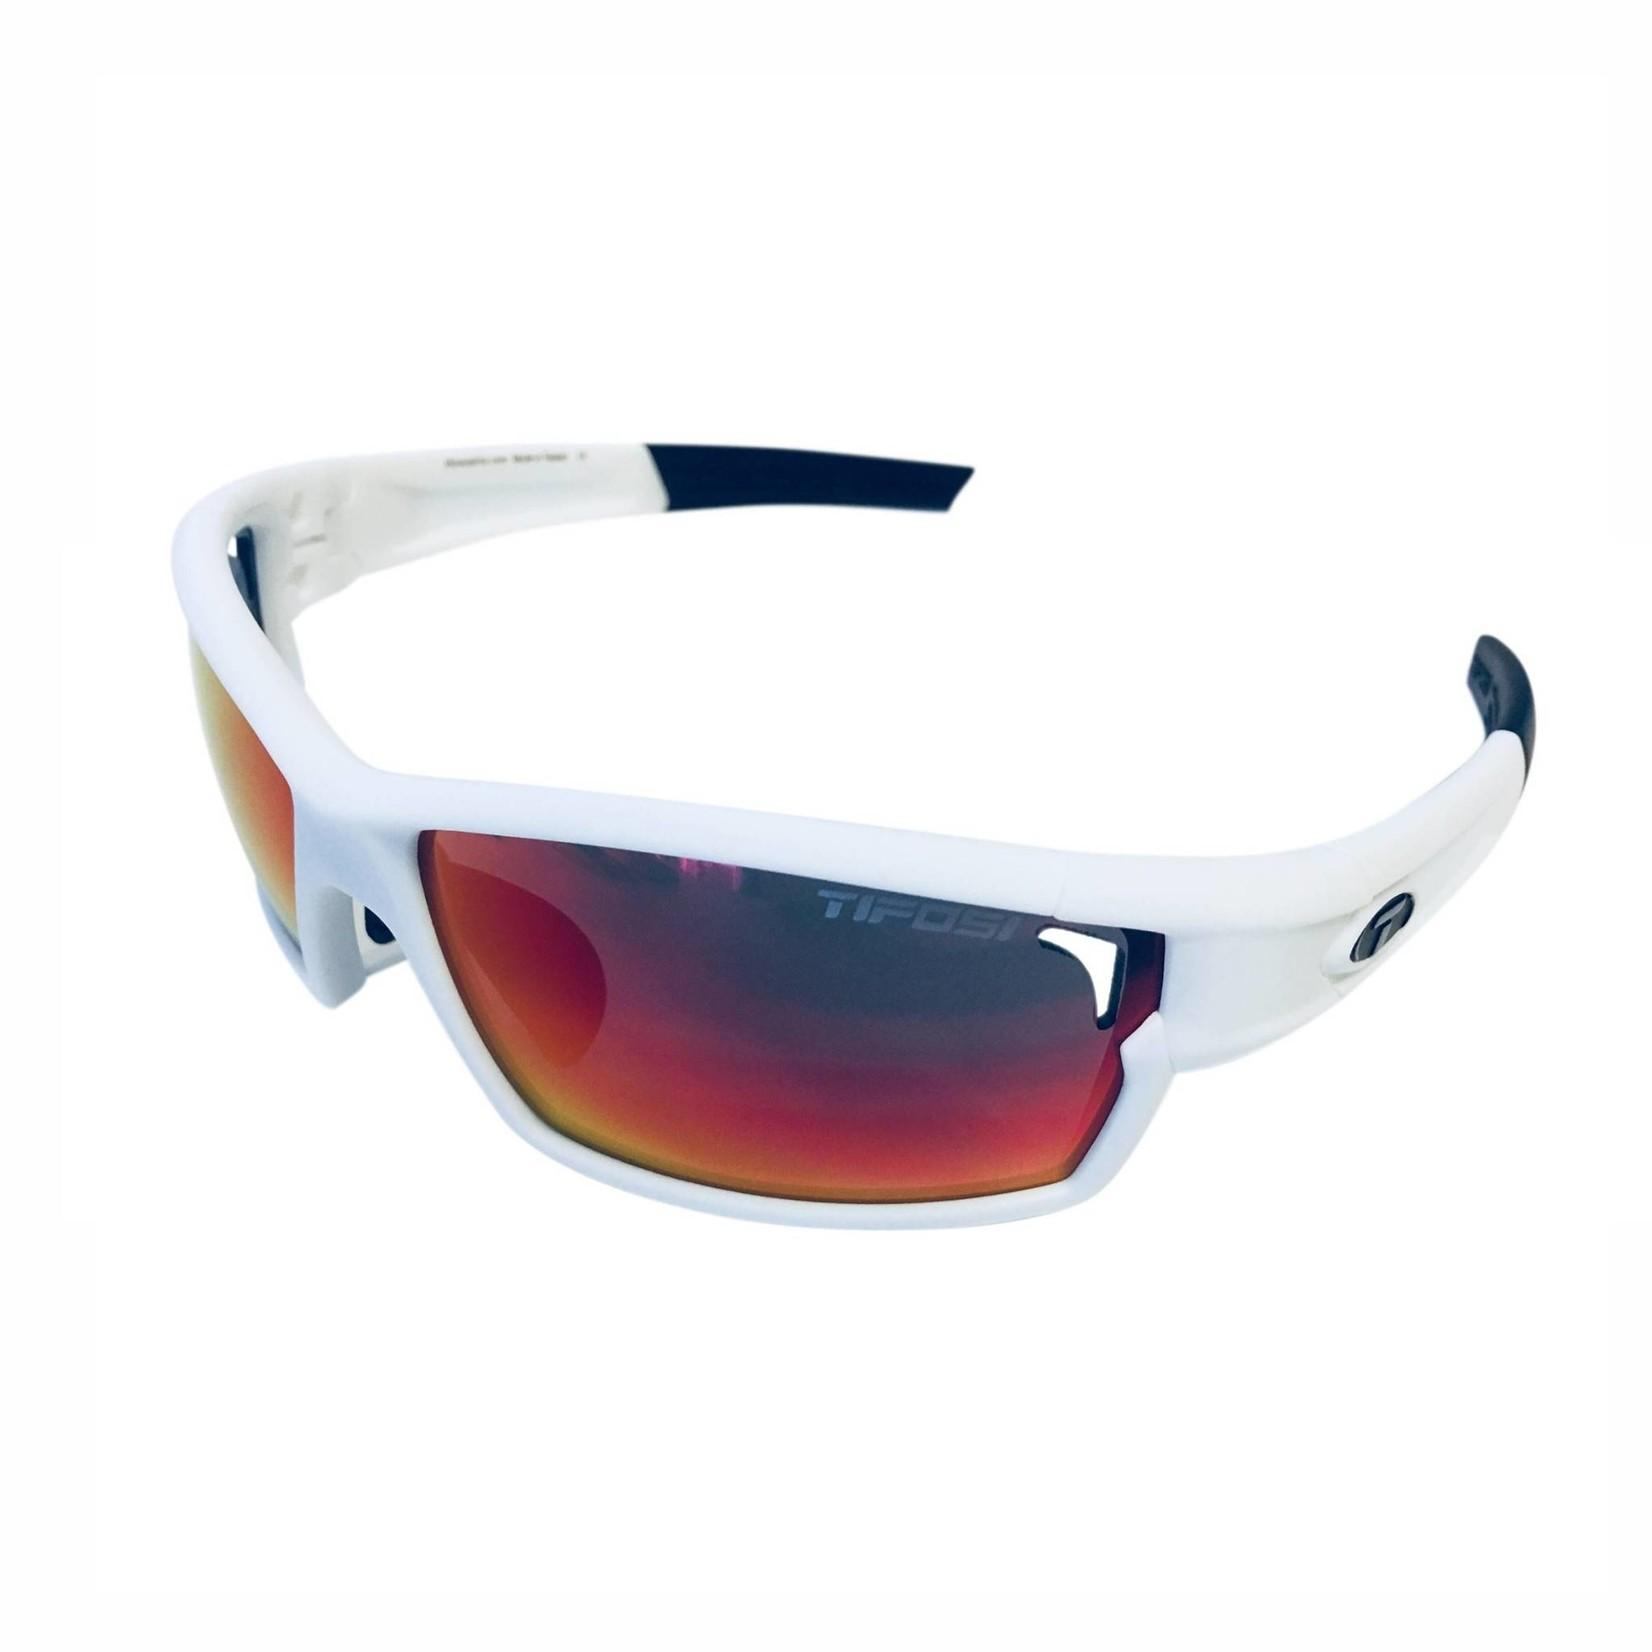 Tifosi Camrock Sunglasses White